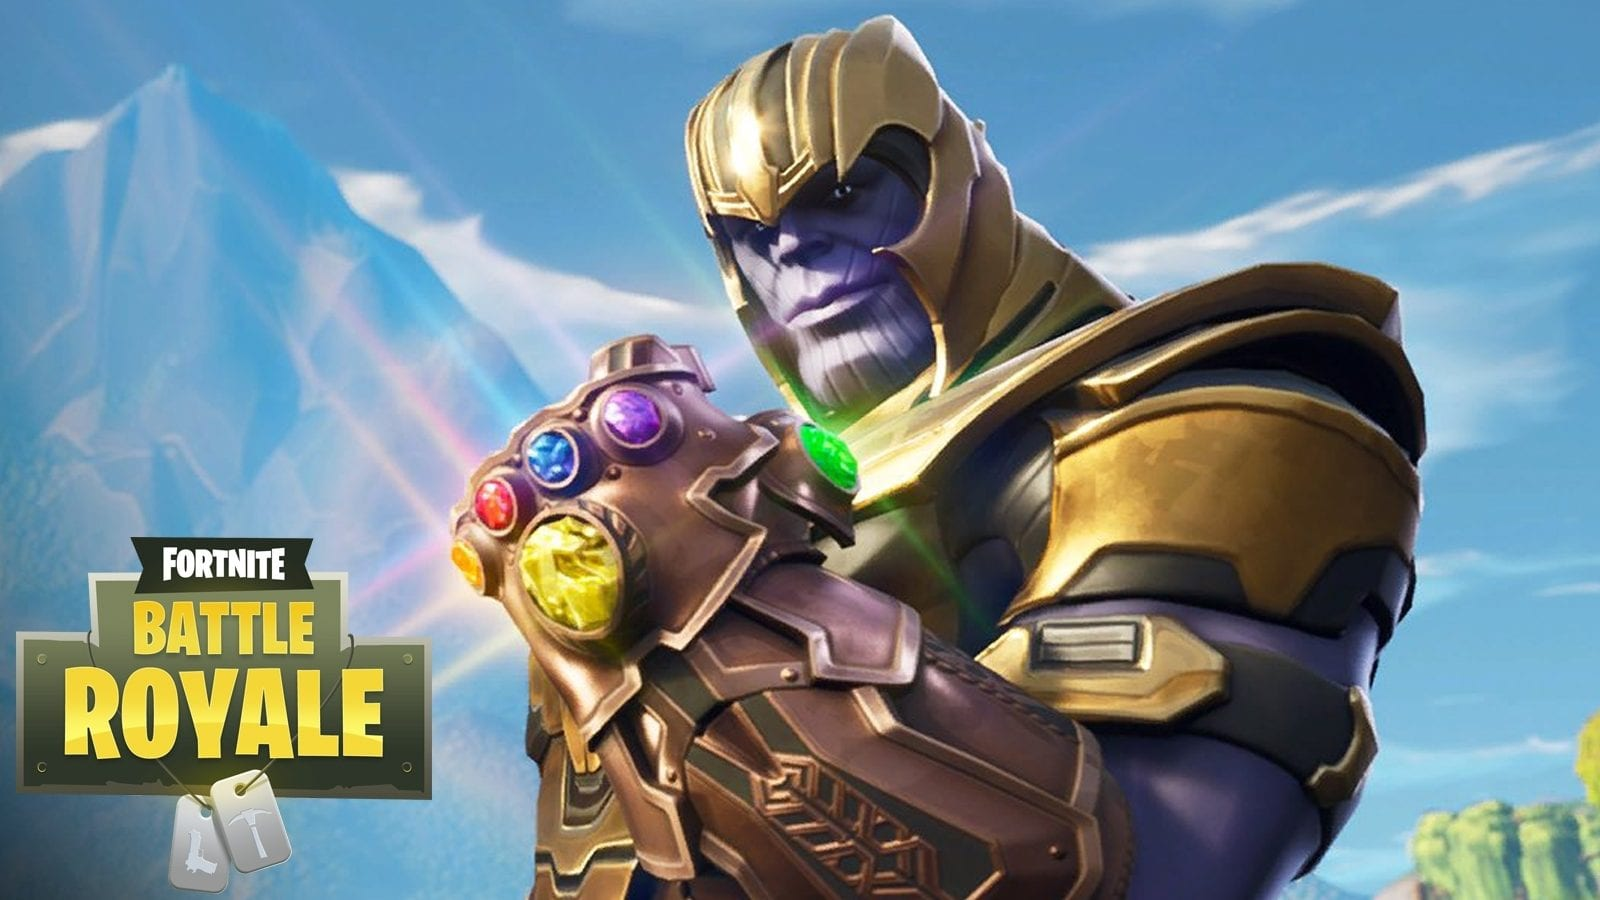 NEWS – Fortnite x Thanos